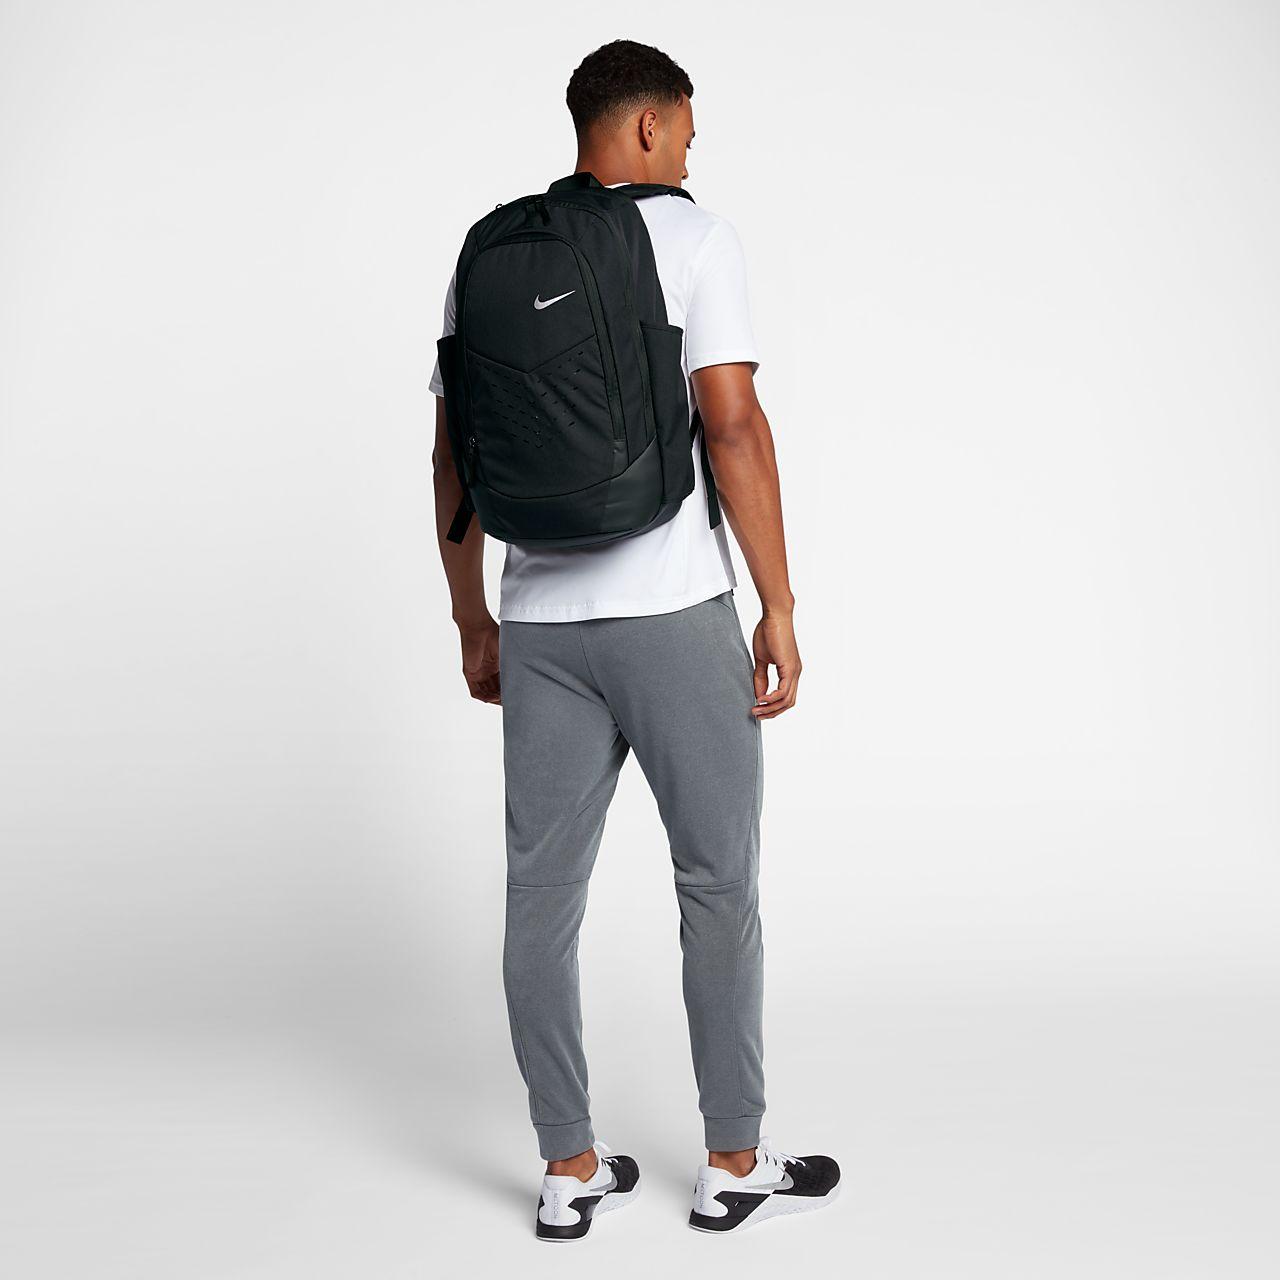 pretty nice 3deb6 07b3d Low Resolution Nike Vapor Energy Training Backpack Nike Vapor Energy  Training Backpack